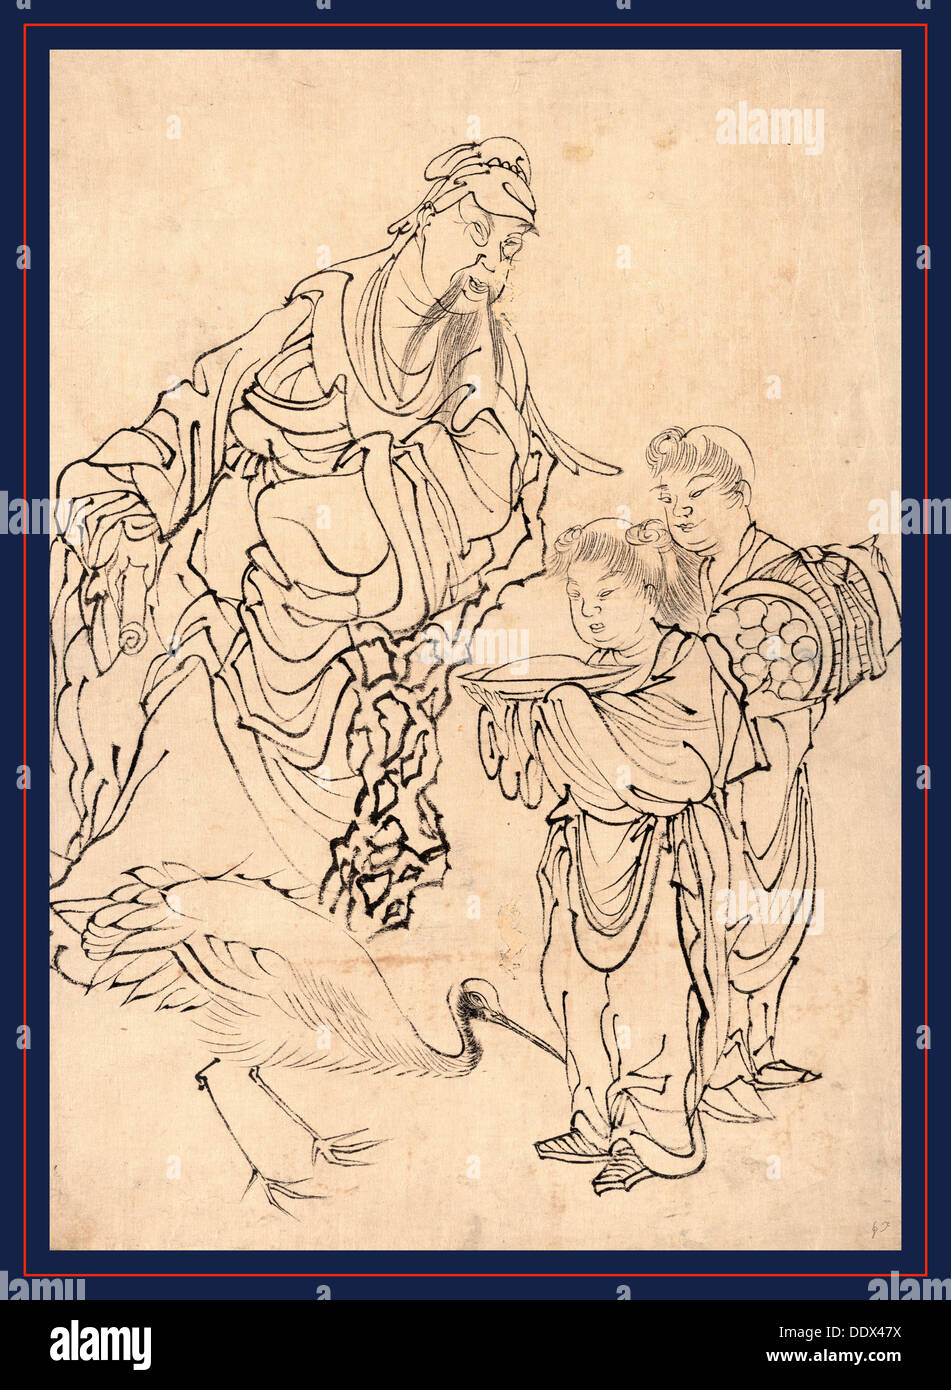 Rin wasei, Rinnasei (Lin Hejing). possibly a  rhea - Stock Image